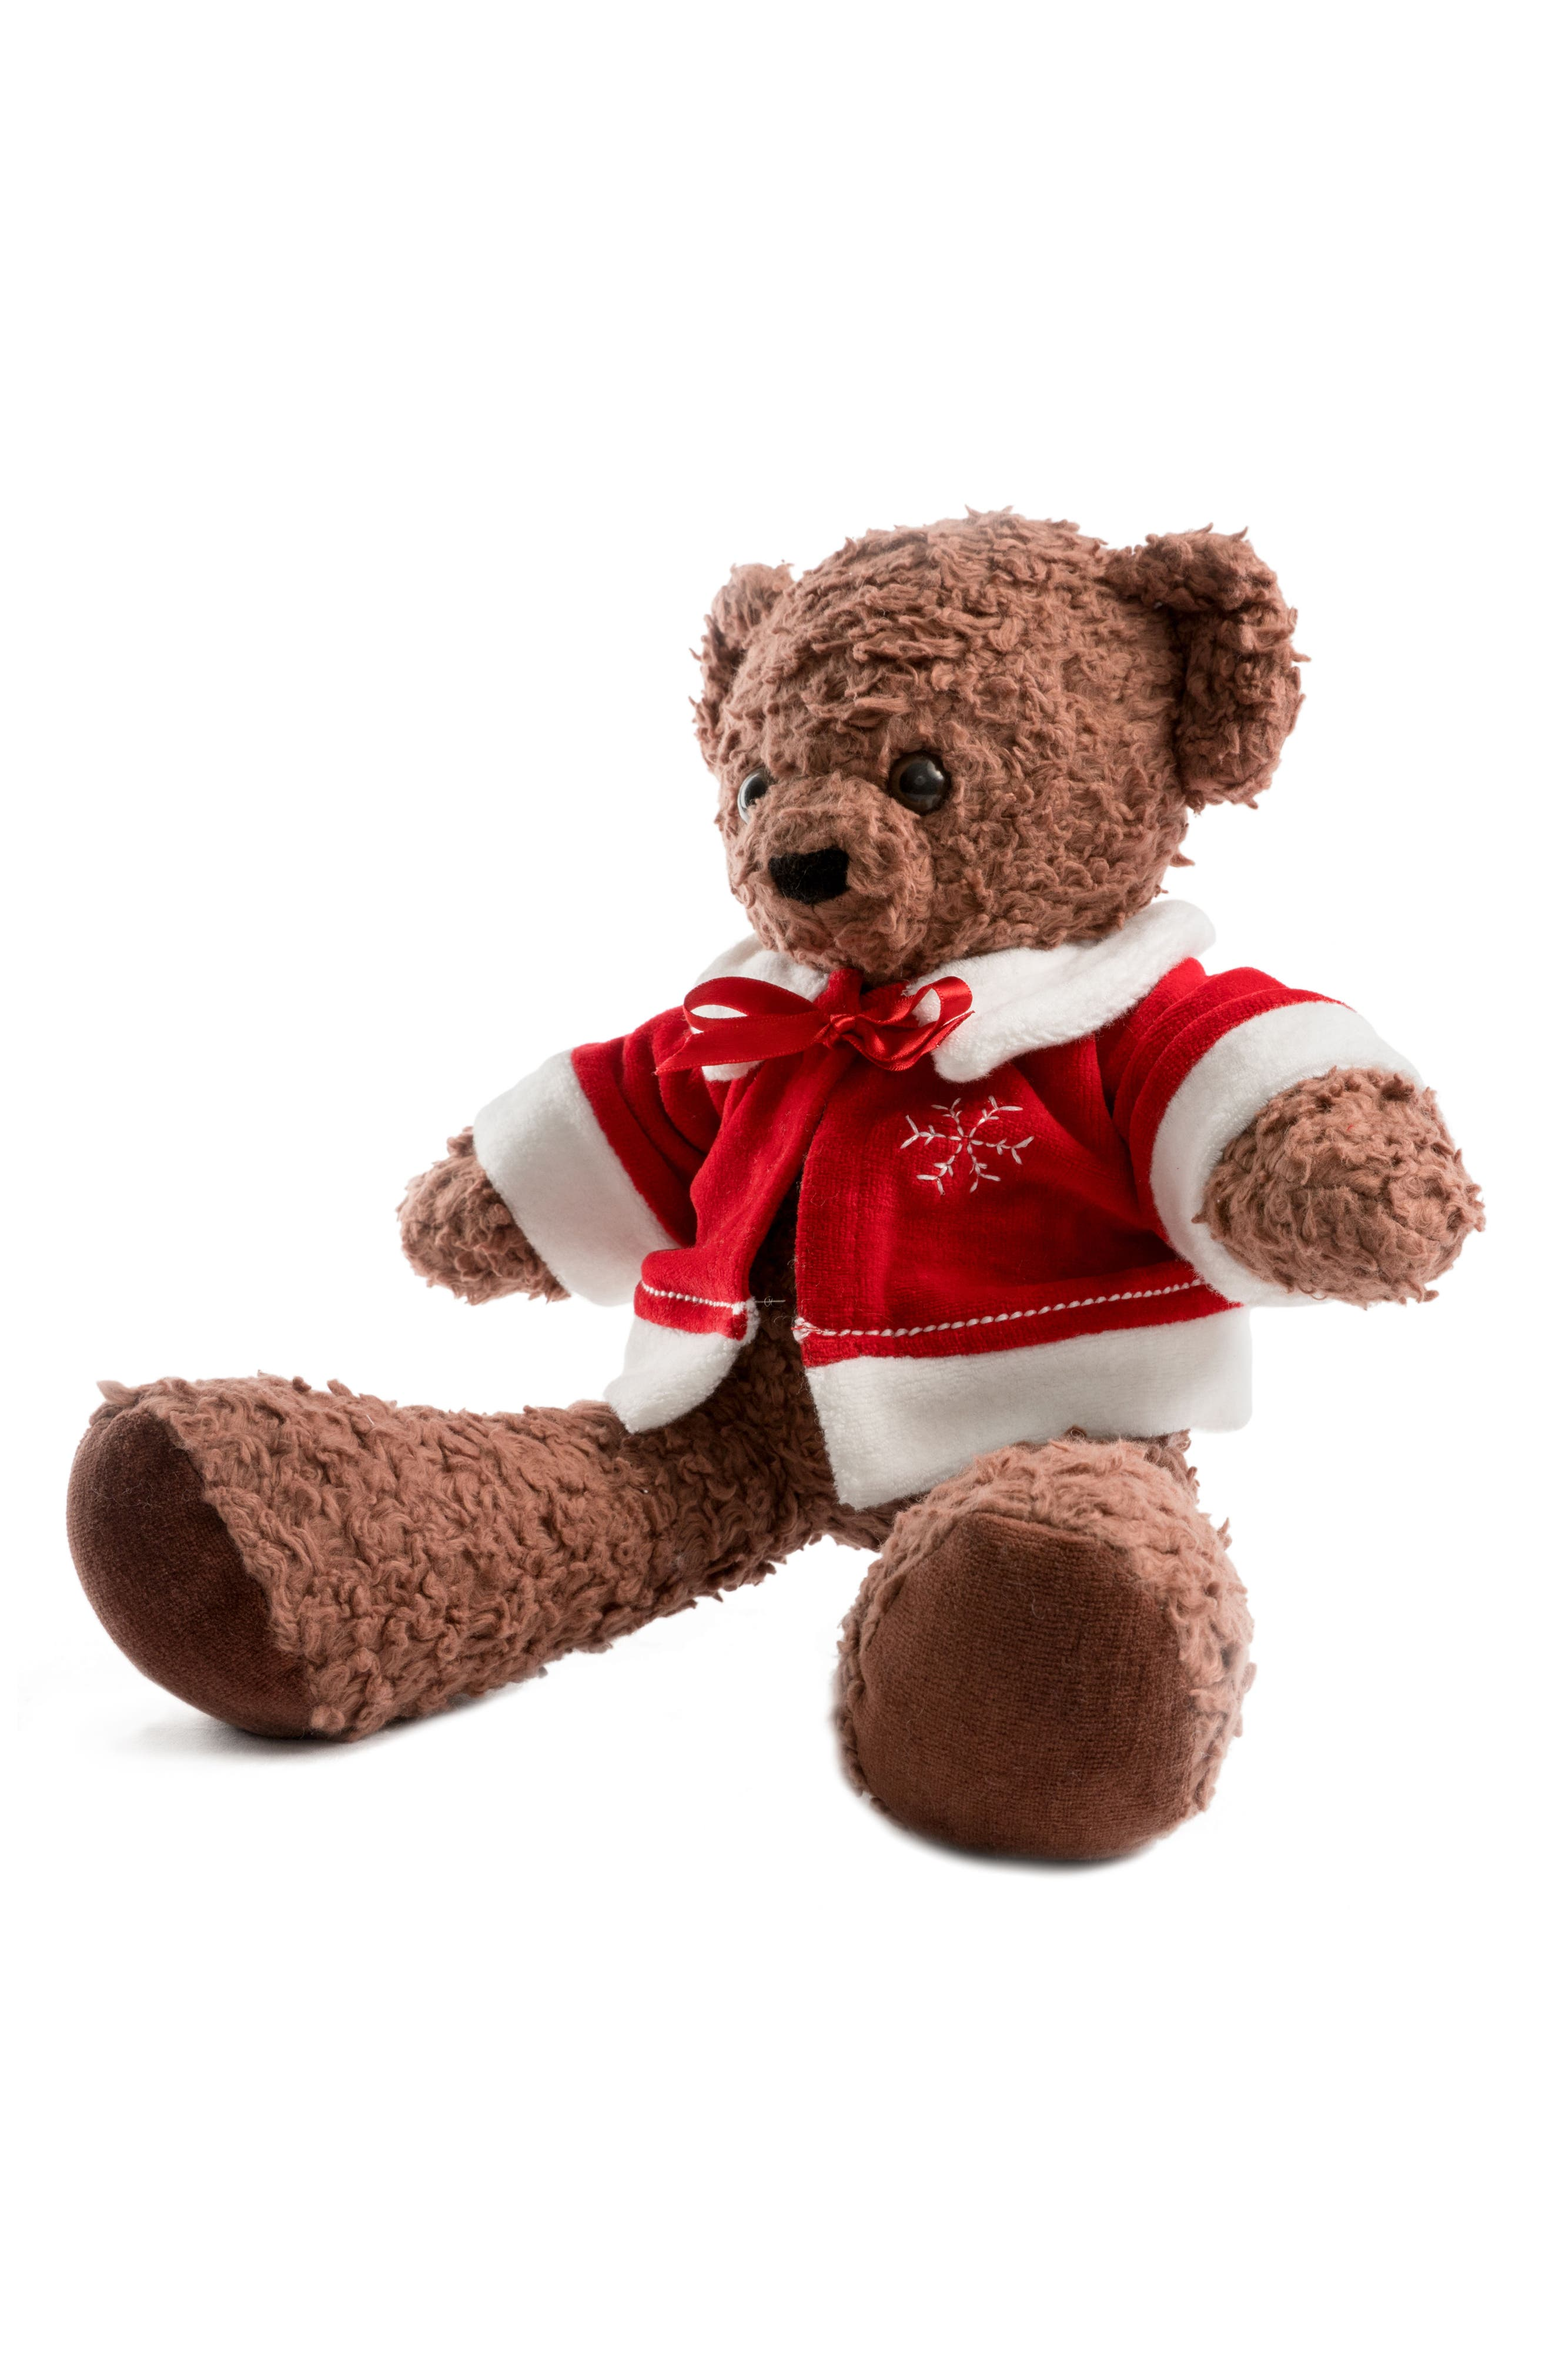 Medium Stuffed Bear with Holiday Jacket,                             Alternate thumbnail 8, color,